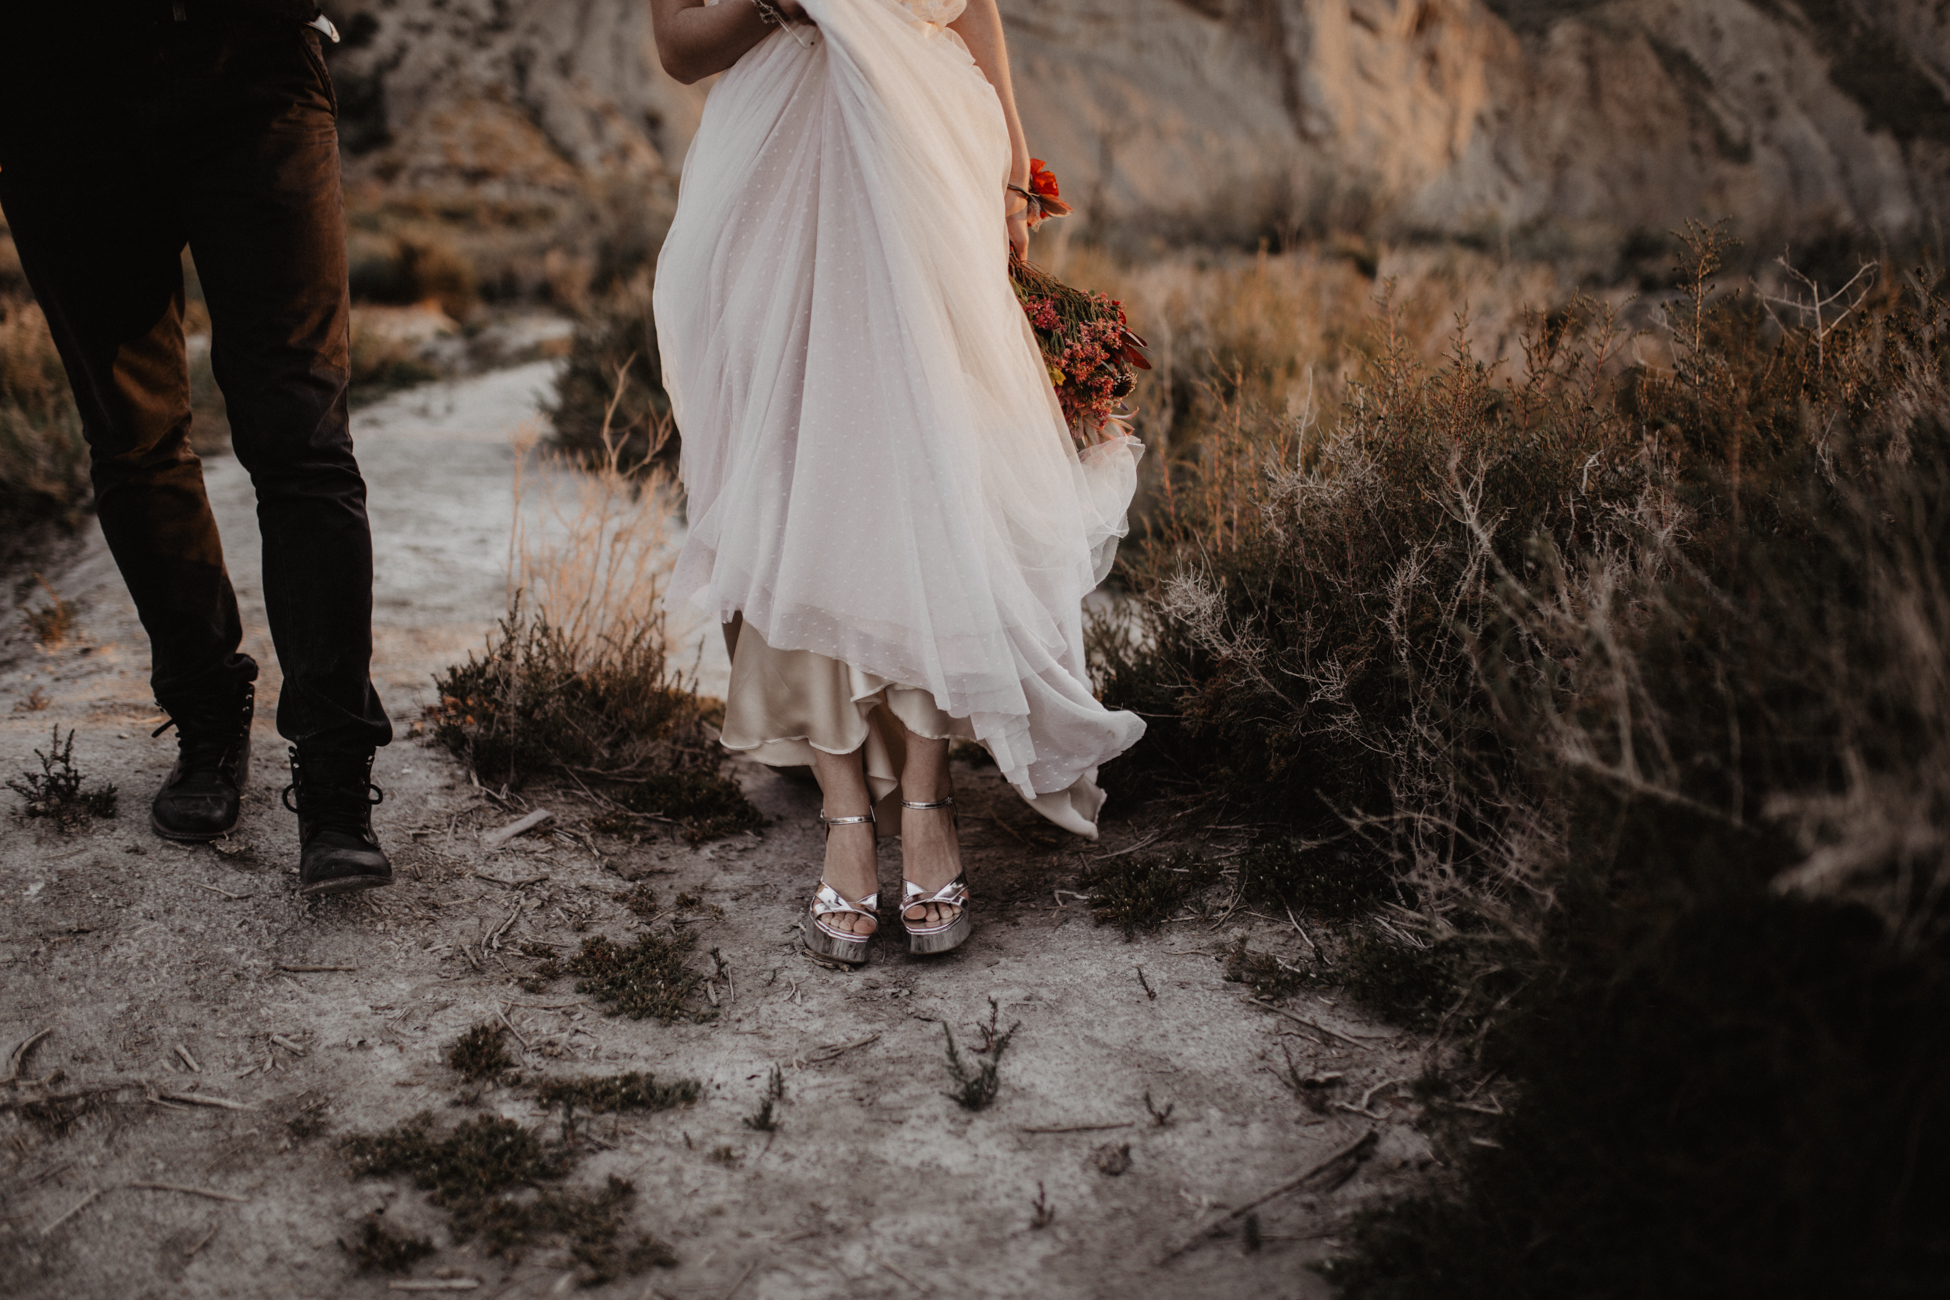 thenortherngirlphotography_photography_thenortherngirl_rebeccascabros_wedding_weddingphotography_weddingphotographer_wood_muebles_deco_bodasdecaramelo_home_bedtime_gaywedding_editorial_desierto_desert_wildestdreams_amortexano-340.jpg